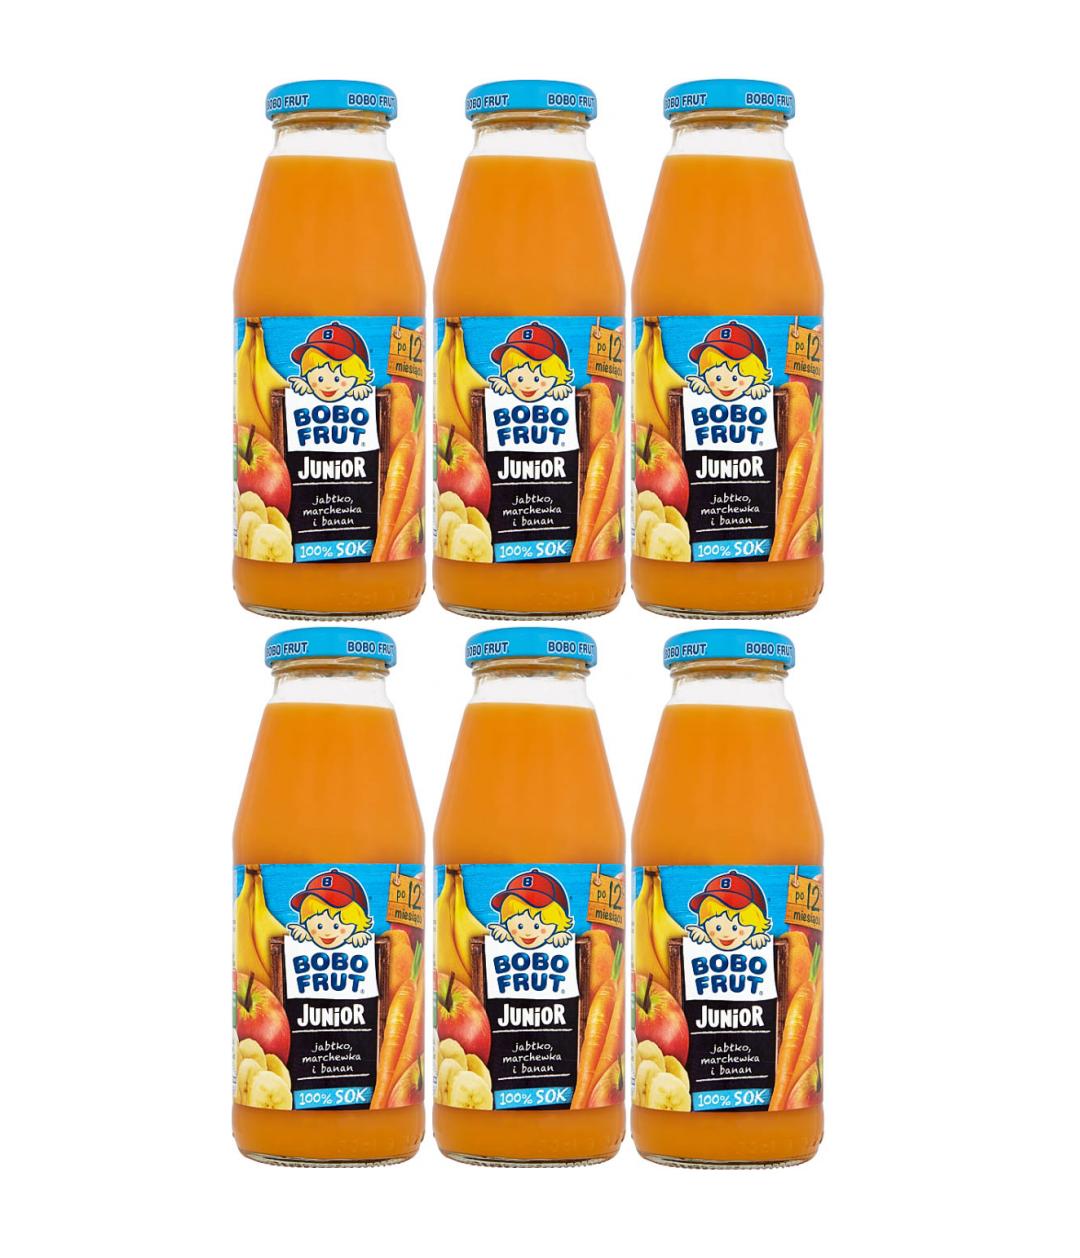 6-pack-BF-J-300ml-jablko-marchewewz-bananem-600×1096